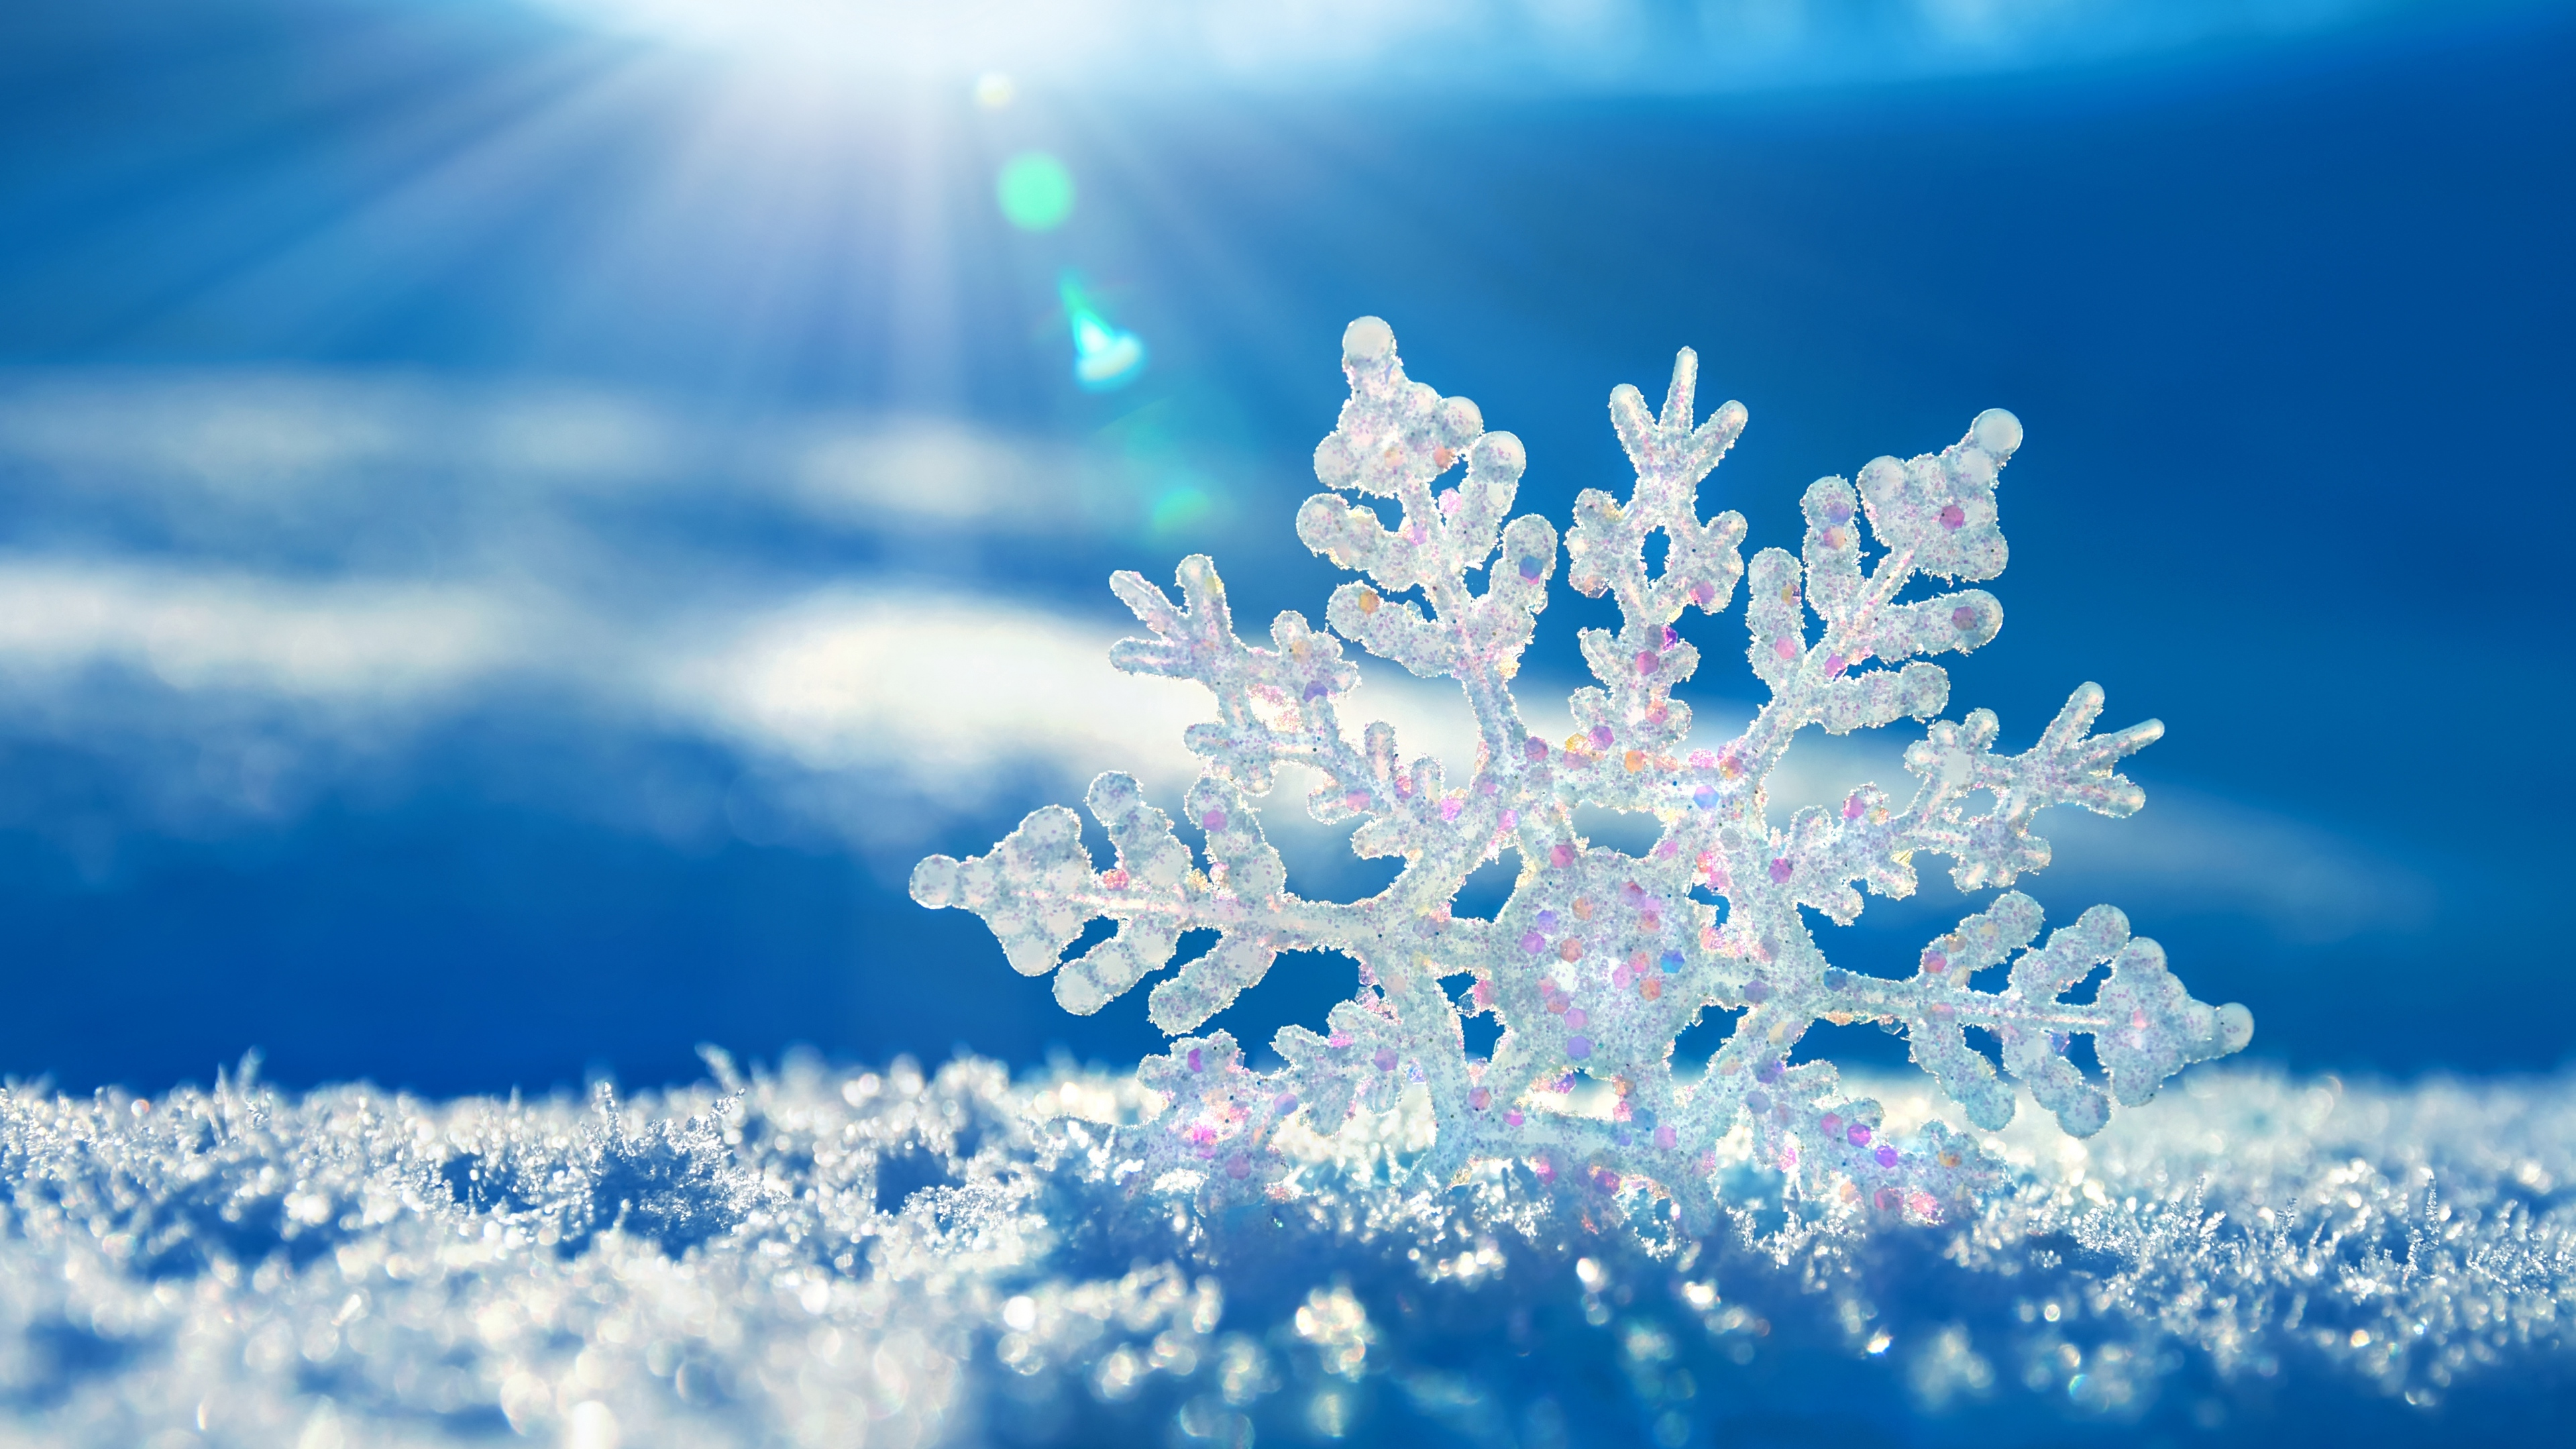 Download Wallpaper 3840x2160 Snow Snowflake Winter 4K Ultra HD HD 3840x2160